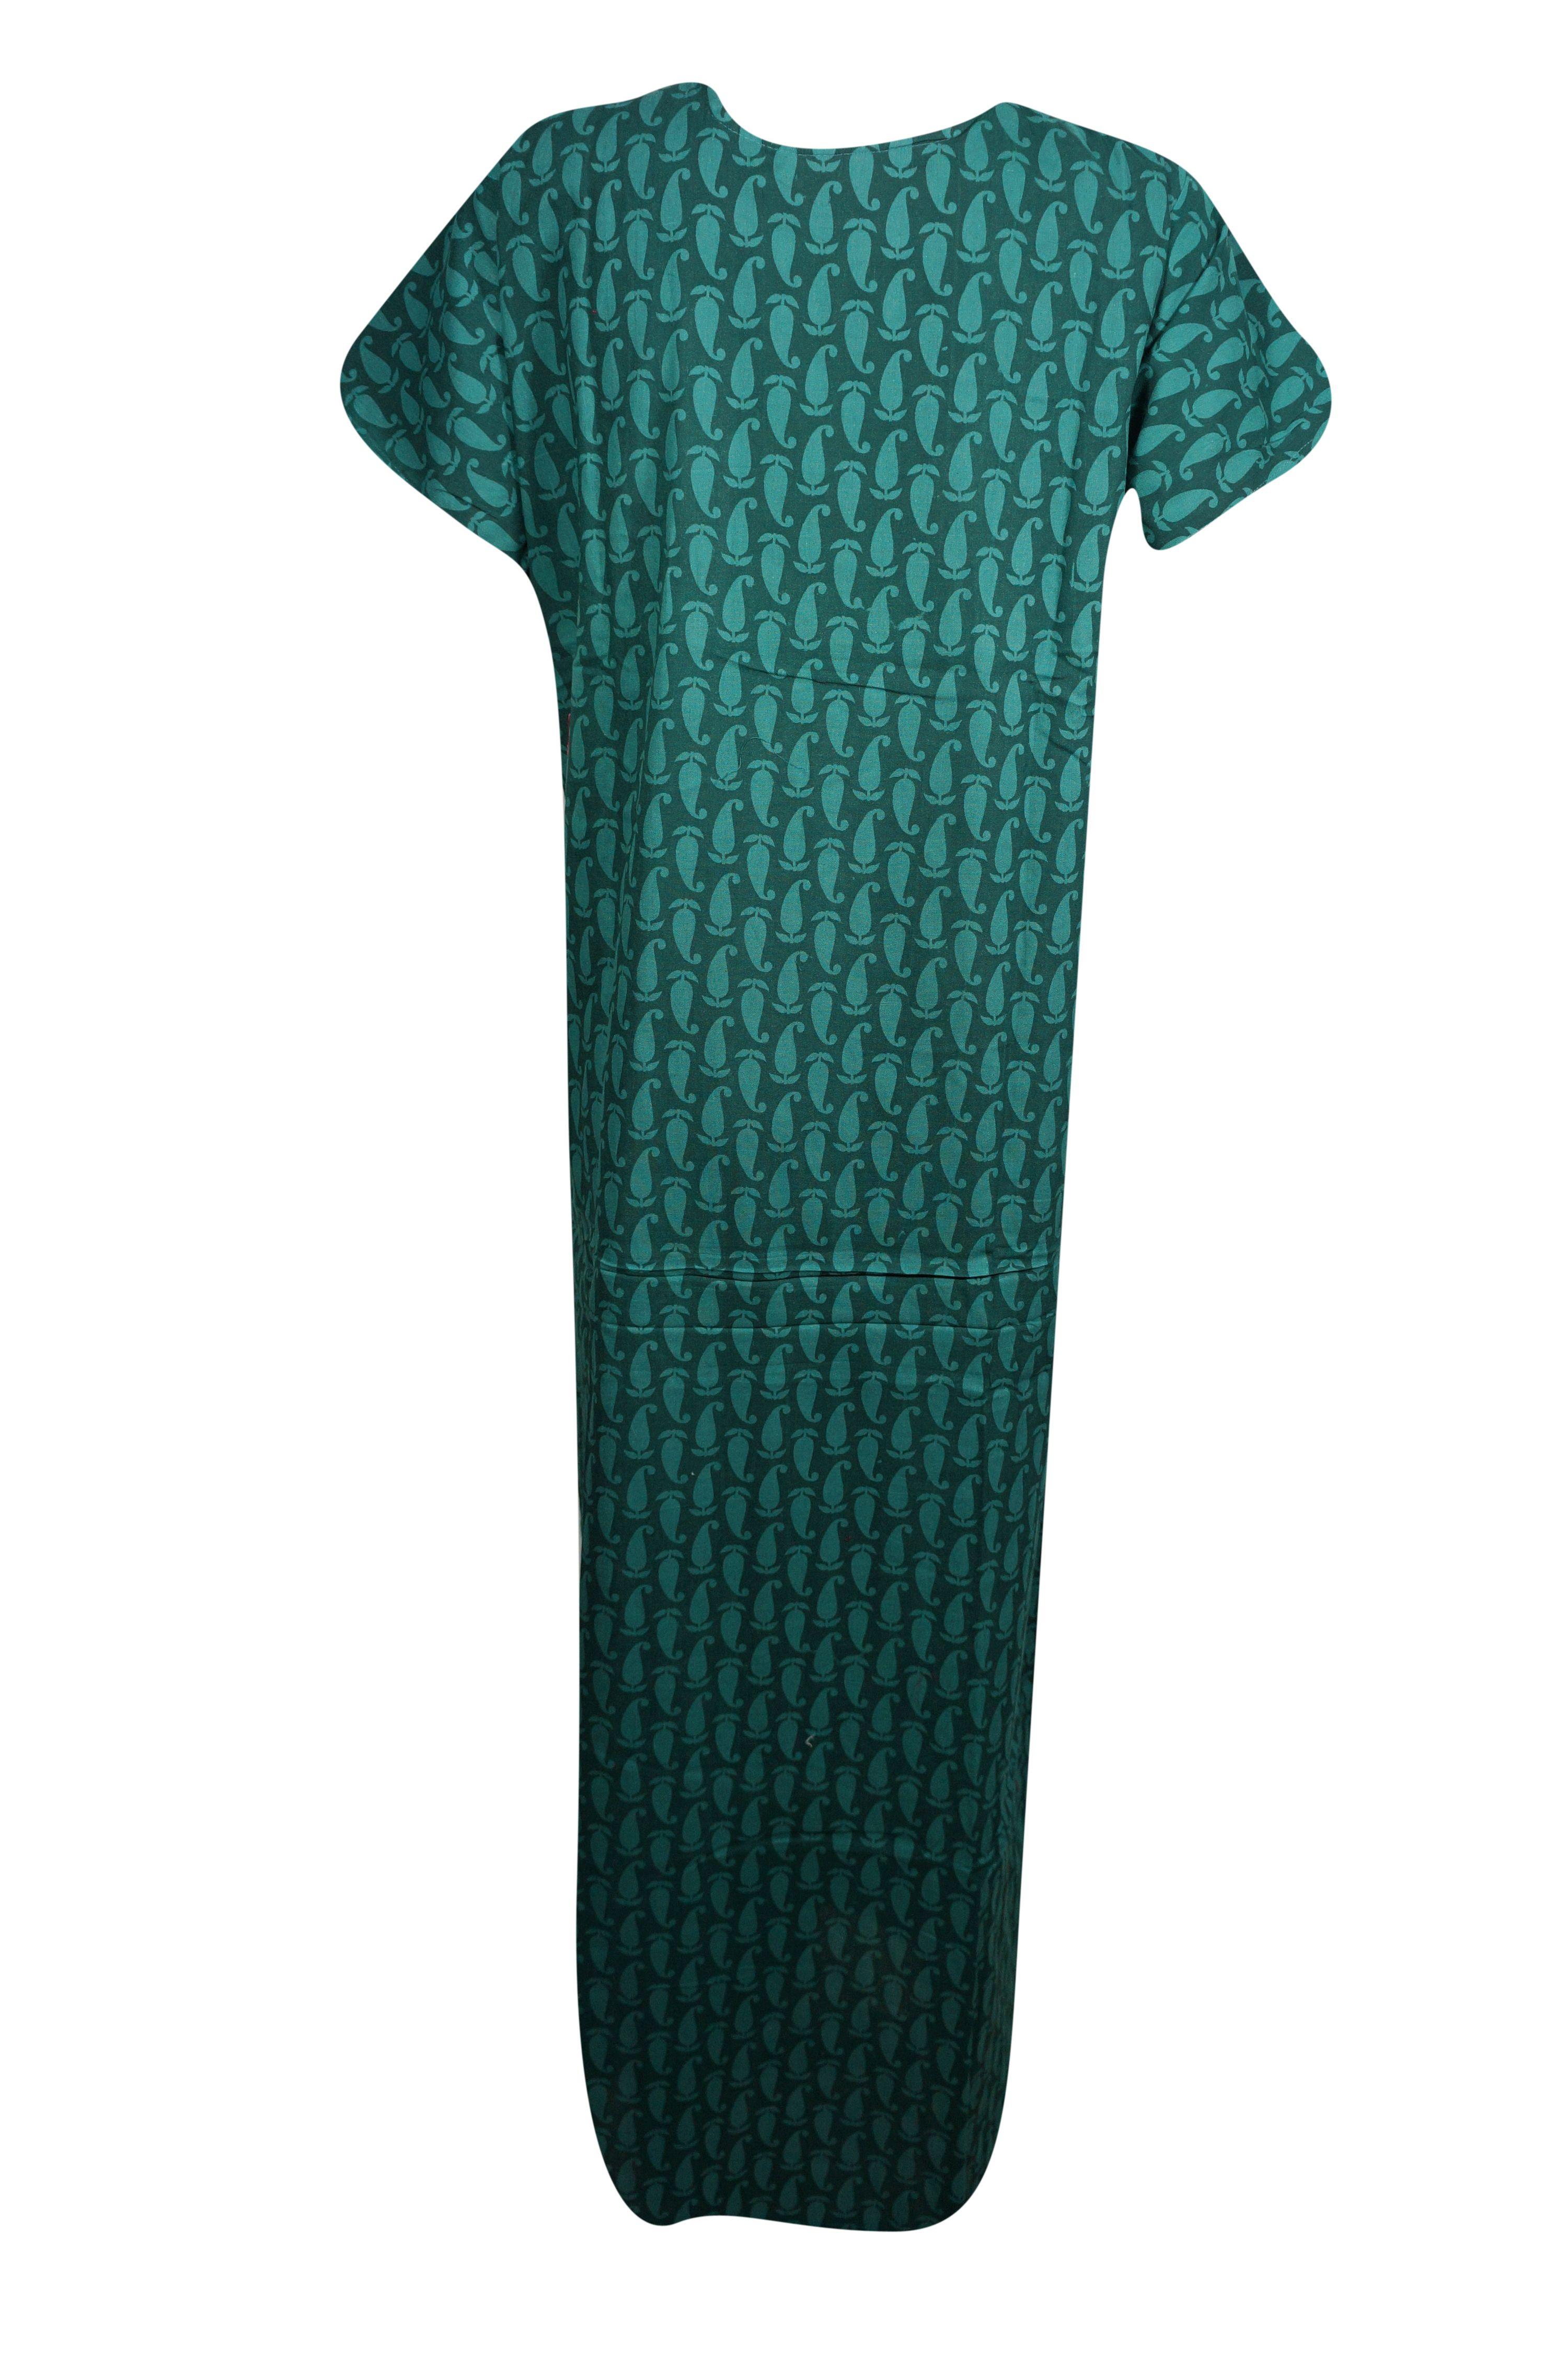 455d012728 Mogul Interior - Mogul Womens Maxi Caftan Dress Neck Embroidered Cotton  Short Sleeves Summer Comfy Evening Kaftan Nightgown L - Walmart.com